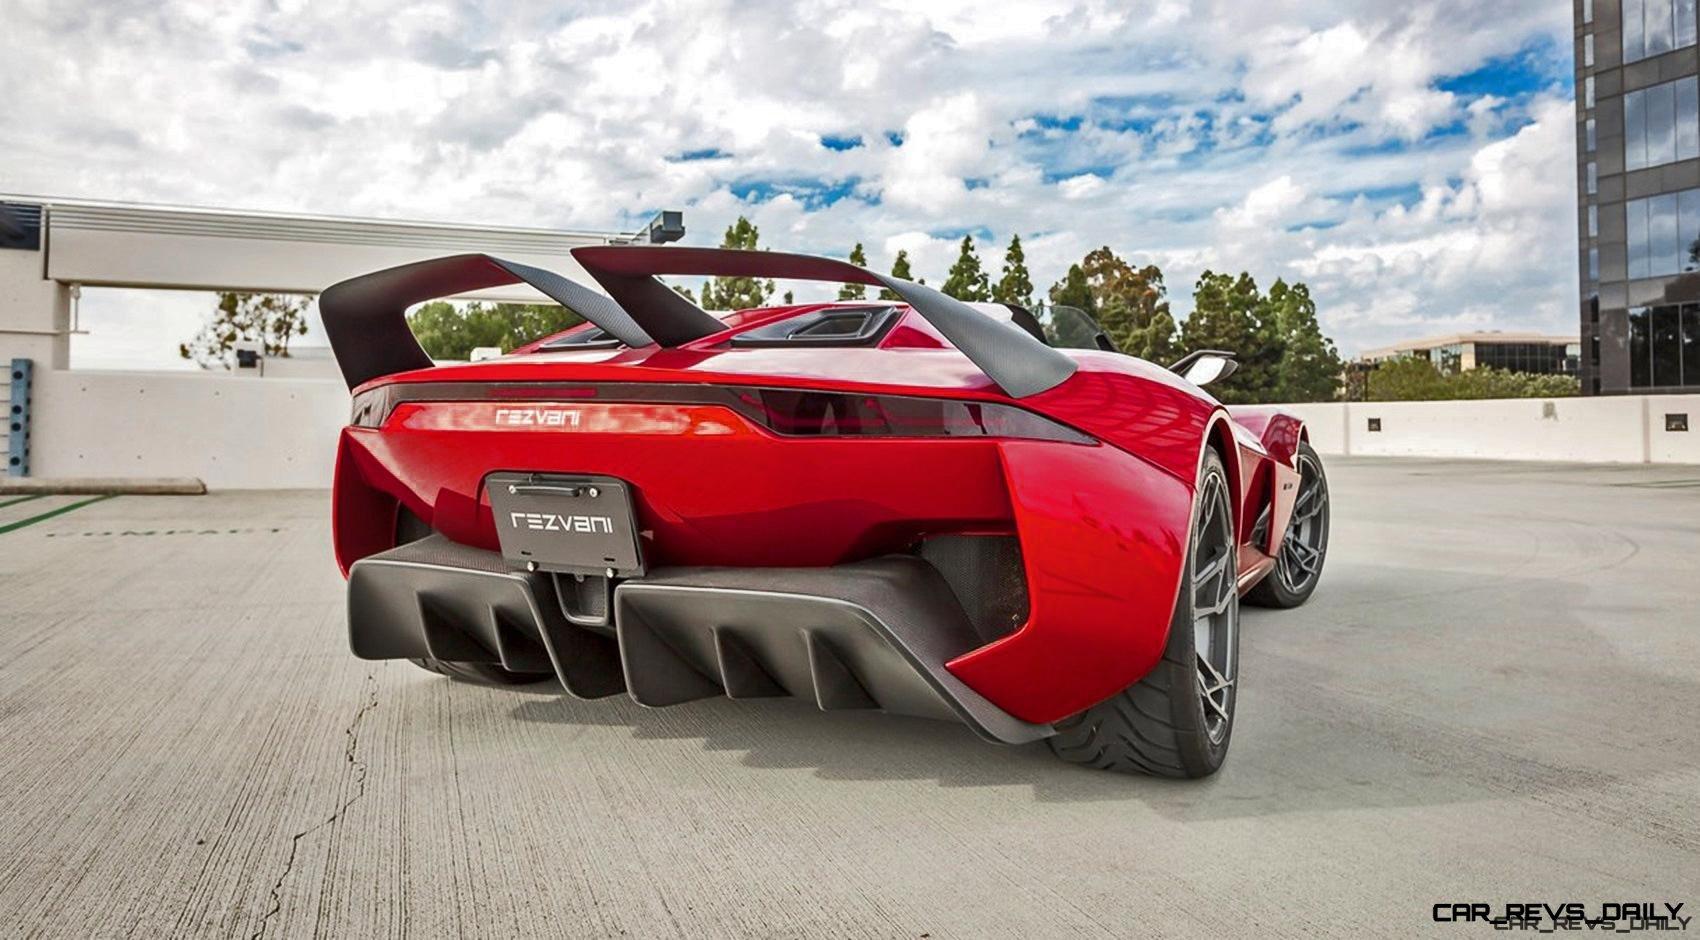 700hp 2 5s 2017 Rezvani Beast X Wild Carbon Wings Monster Boost For Street Legal Racecar Car Revs Daily Com